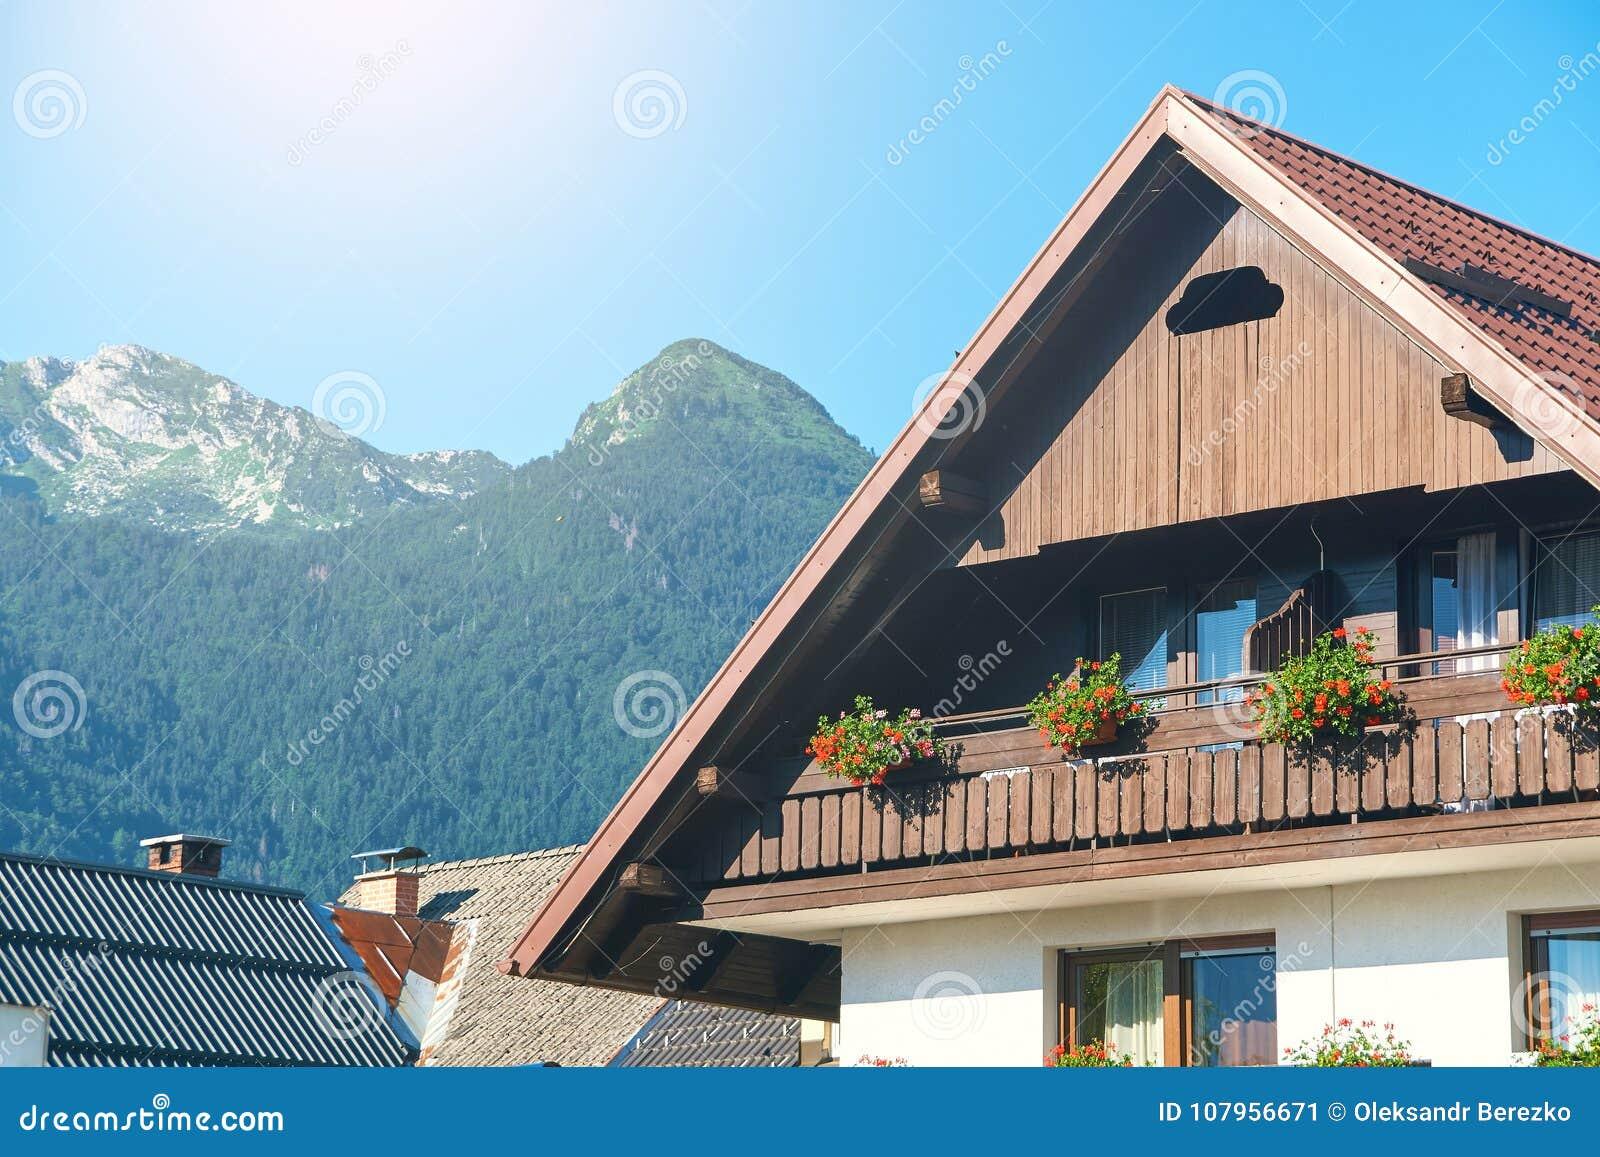 Pequeño hotel pintoresco típico en las montañas de Eslovenia